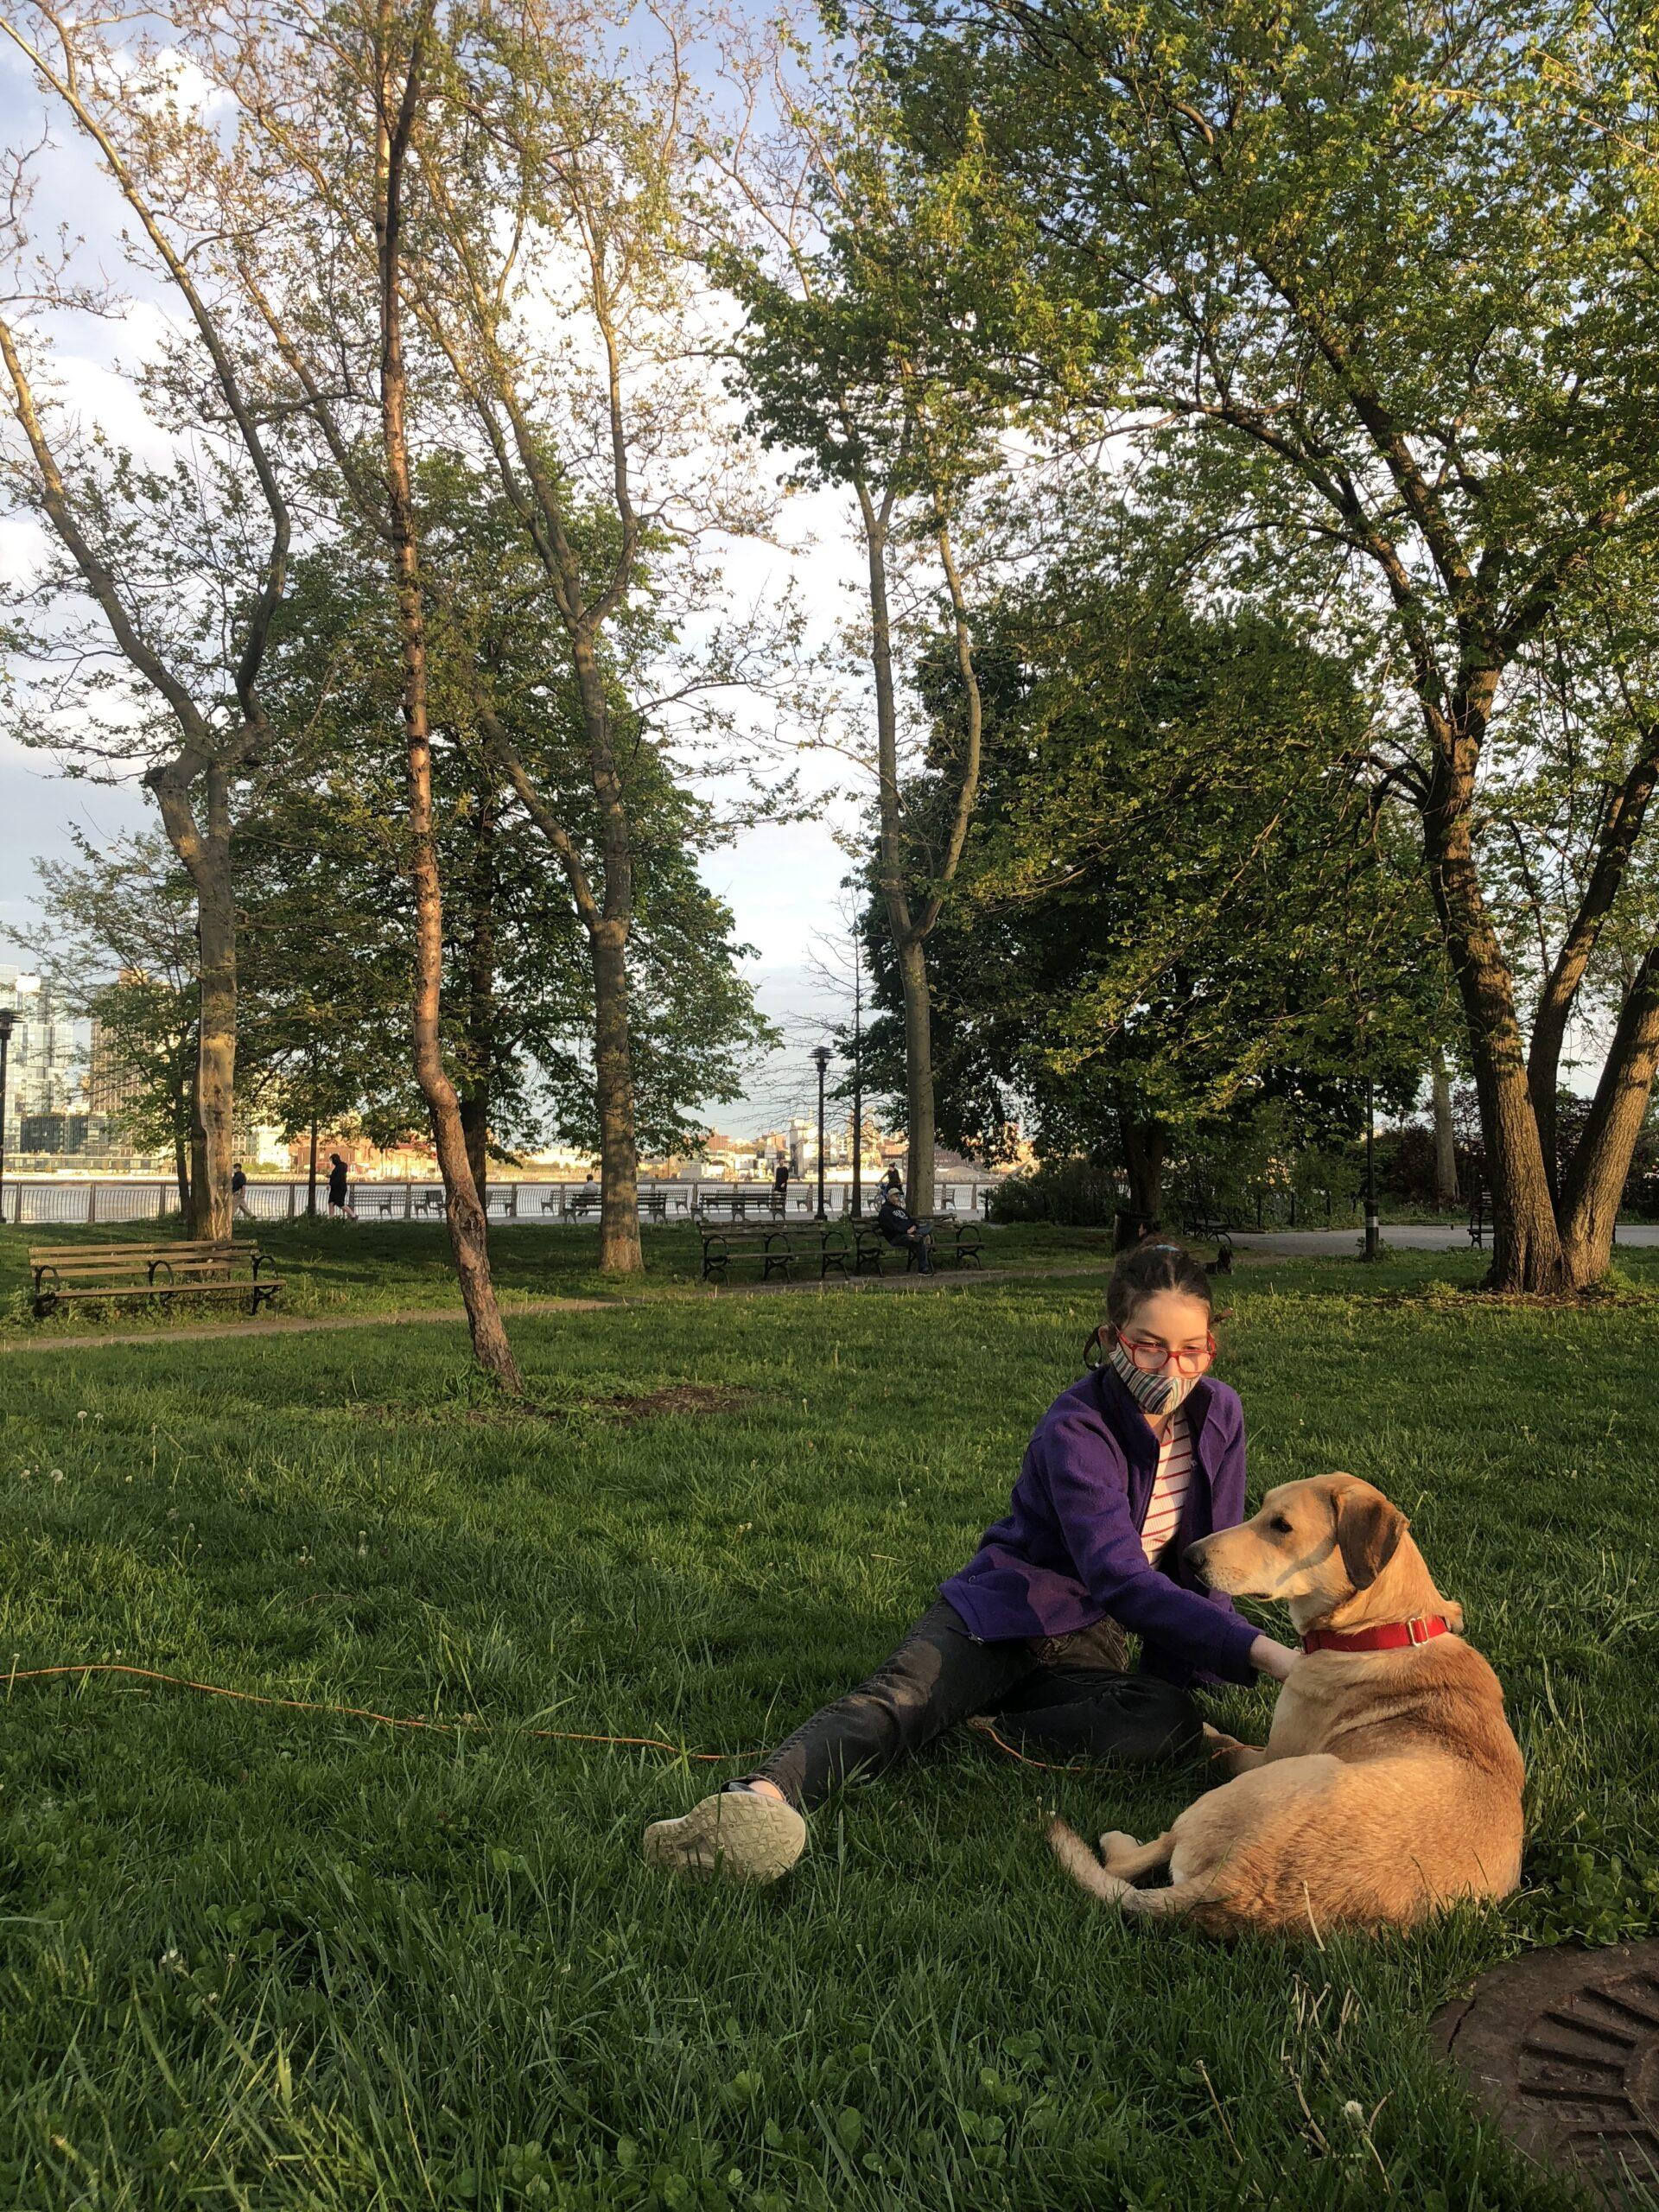 Amalia and her dog